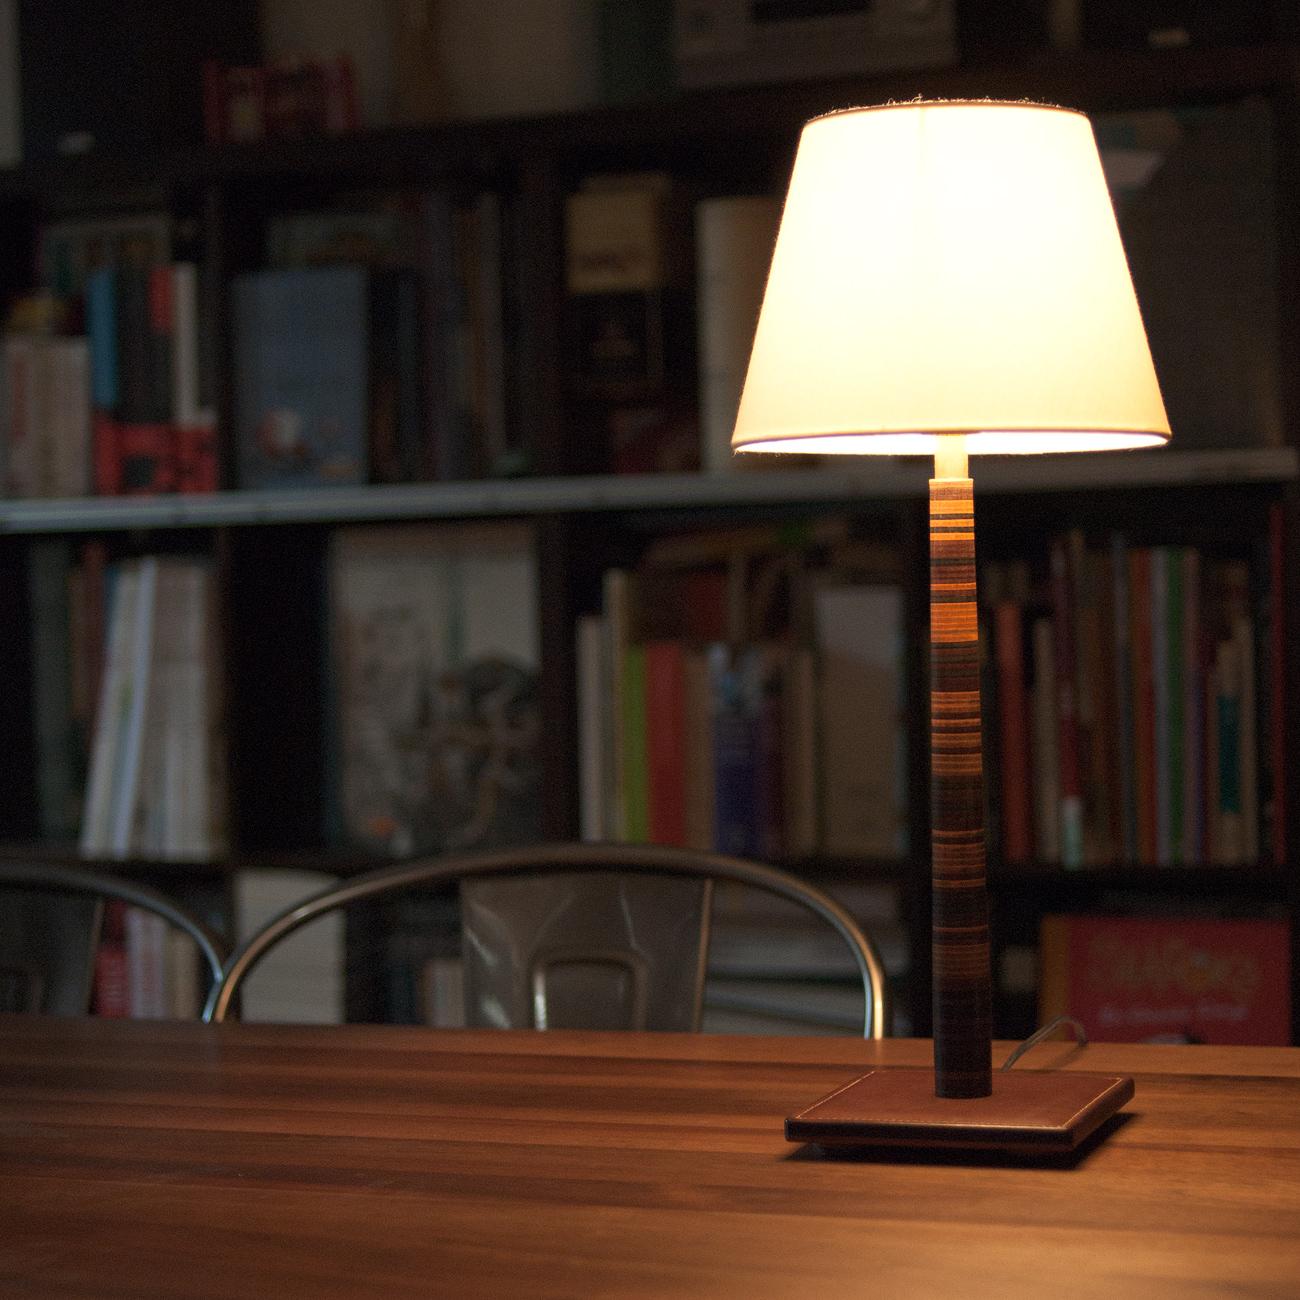 lampe_table01_img02_HD